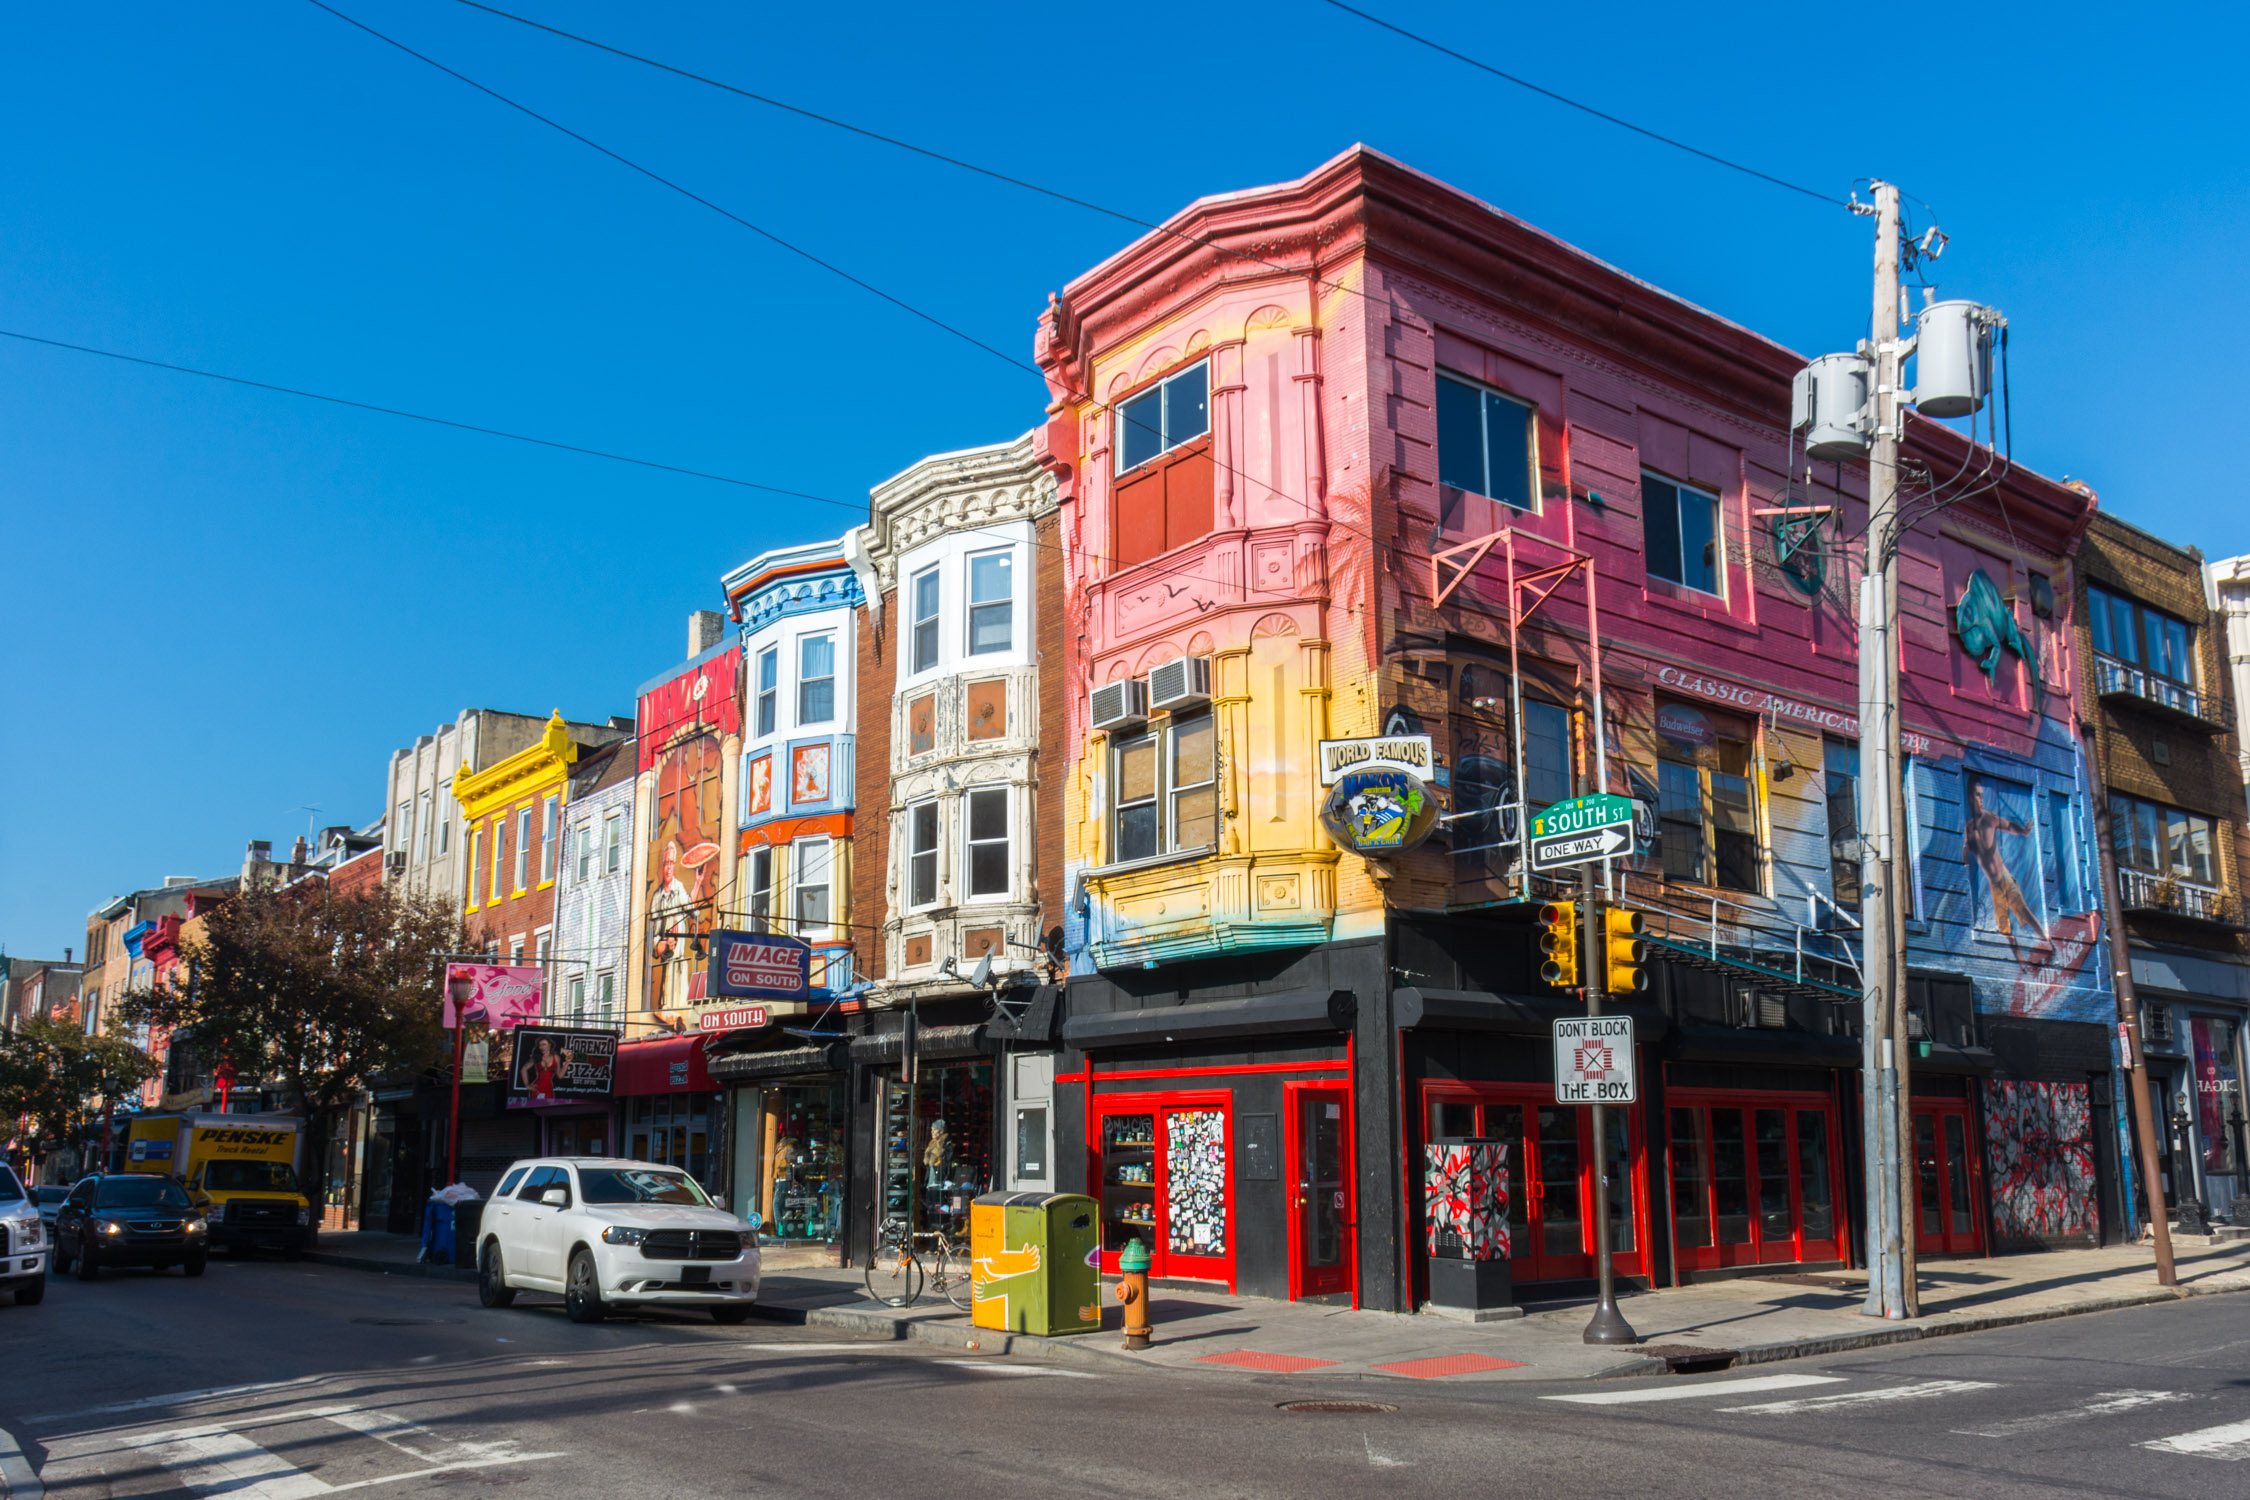 Philadelphia's artistic and avant-garde South Street neighborhood